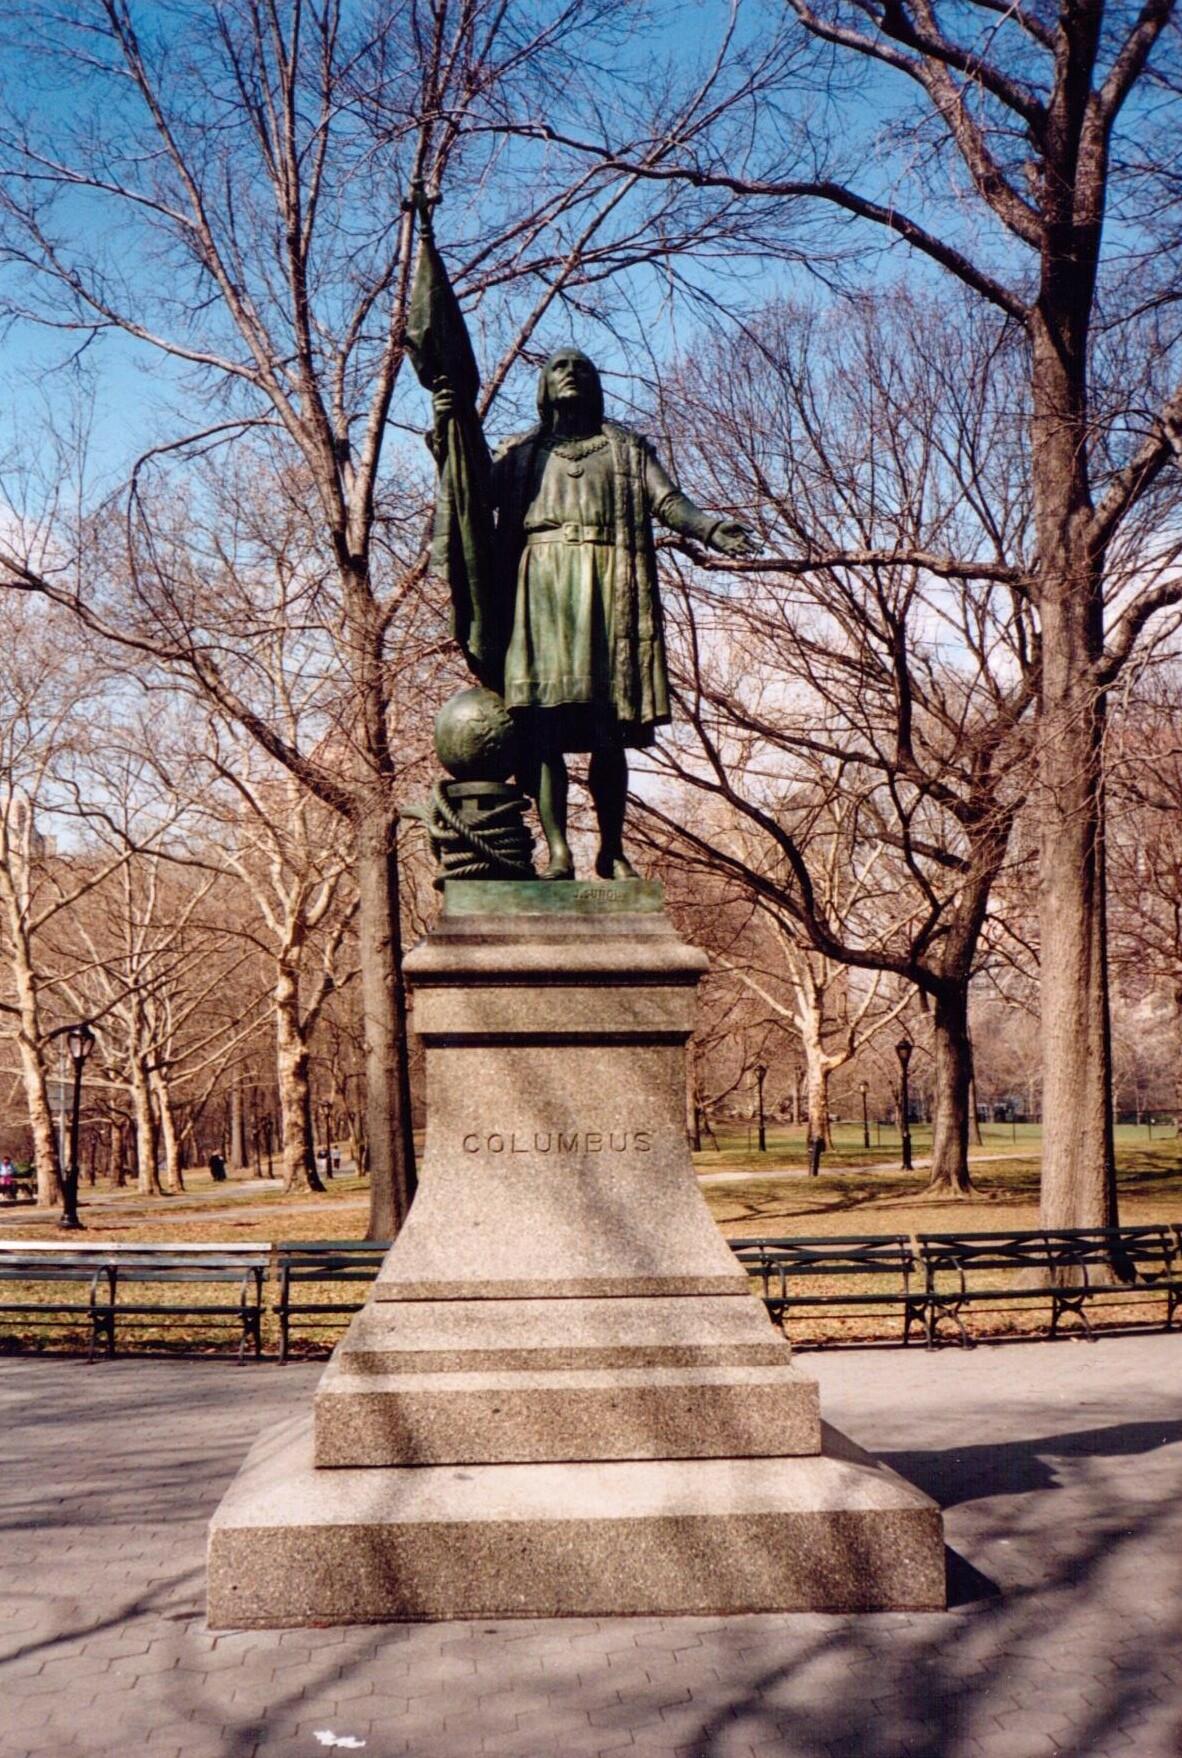 FileChristopher Columbus Statue Central Park New York City By Jernimo Suol 1995jpg